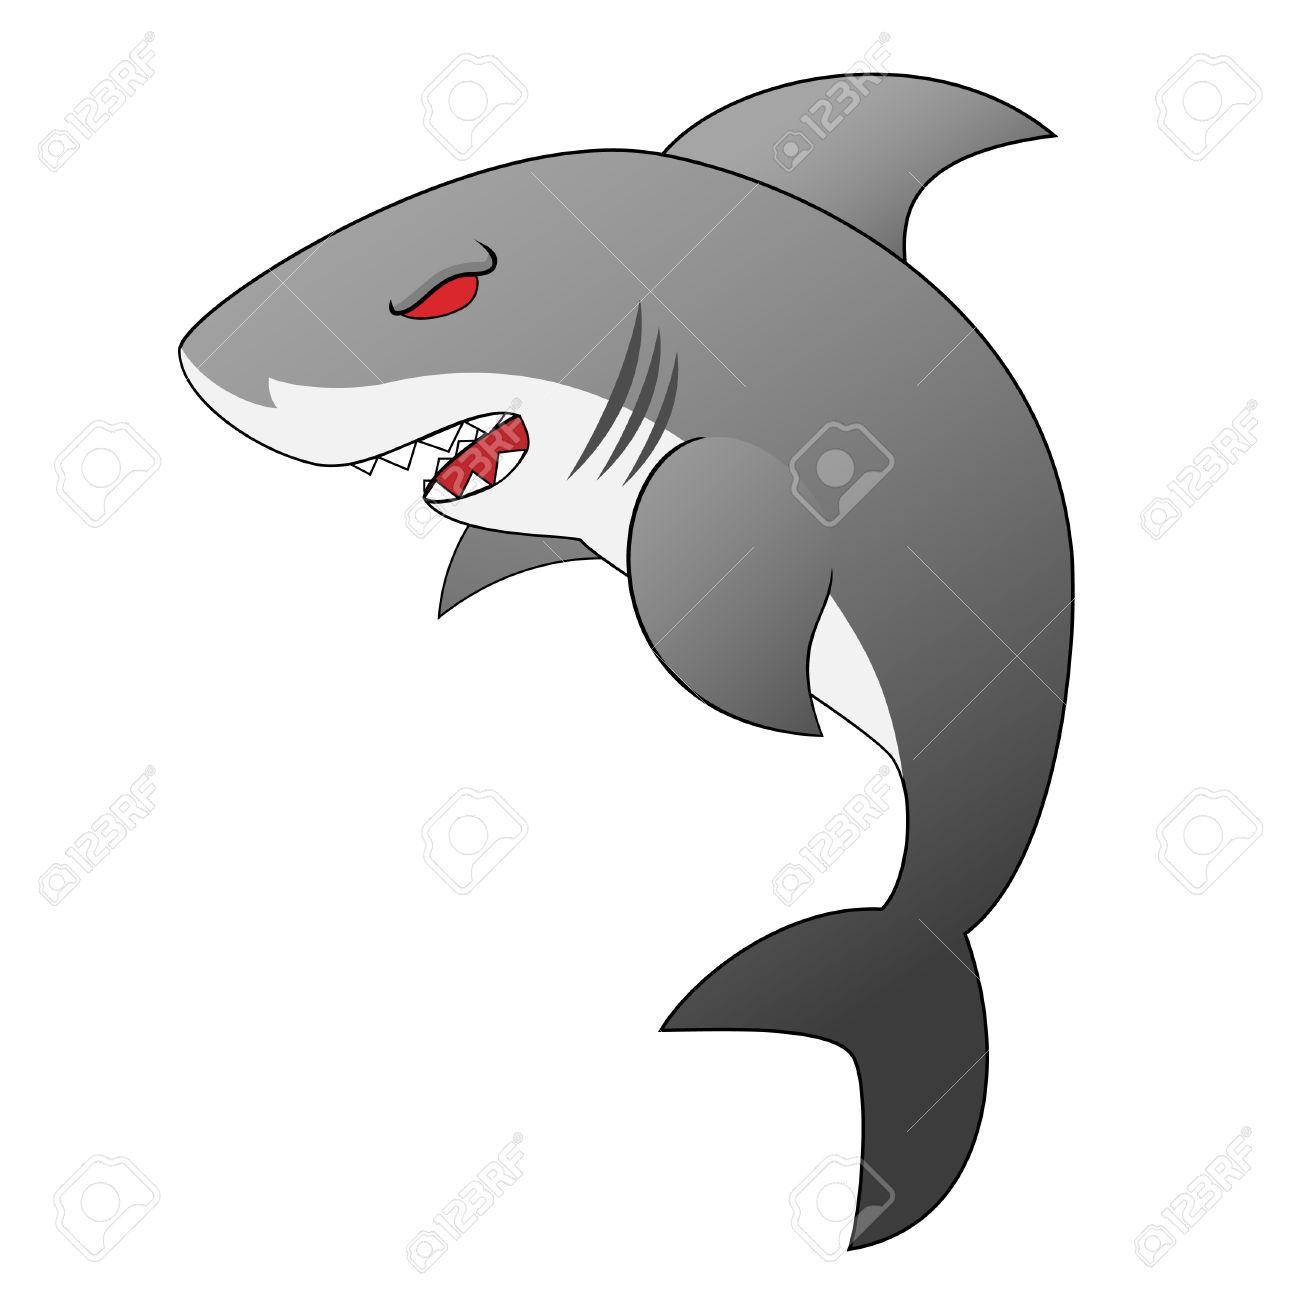 Angry Looking Cartoon Shark With Menacing Sharp Teeth And Red Eyes Stock Vector - 4450195